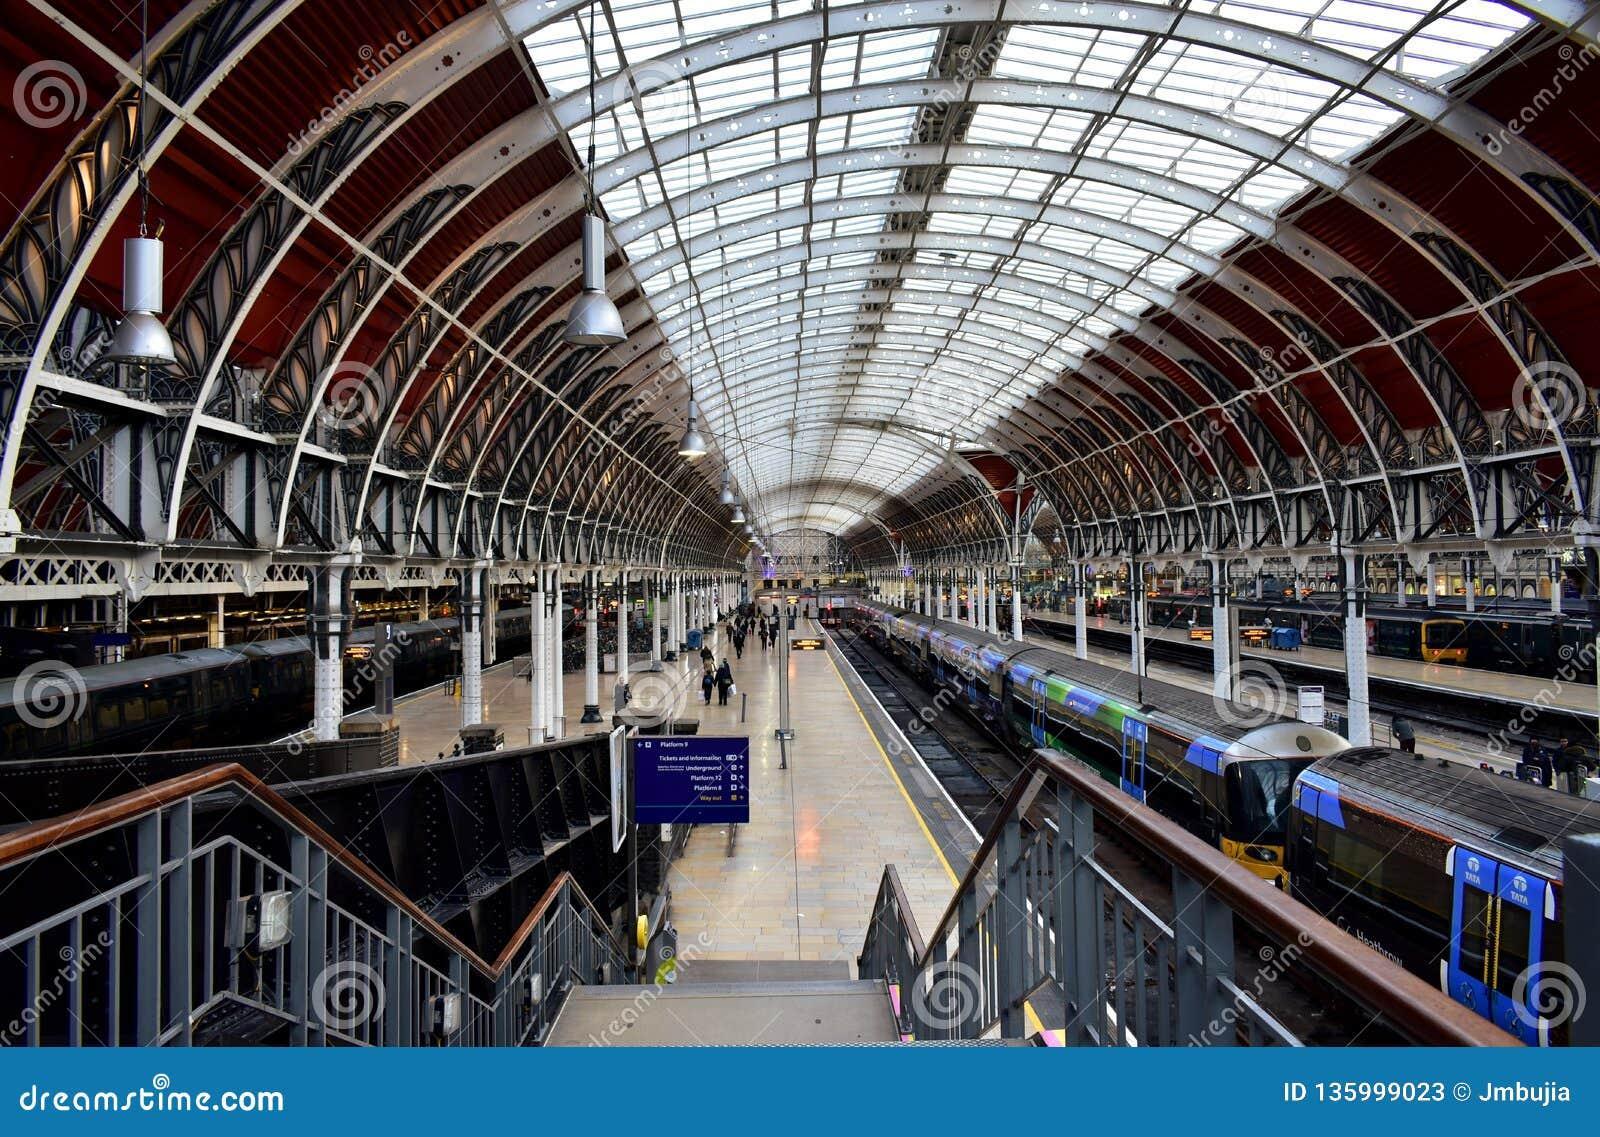 Paddington Train Station with victorian train shed. London, United Kingdom.